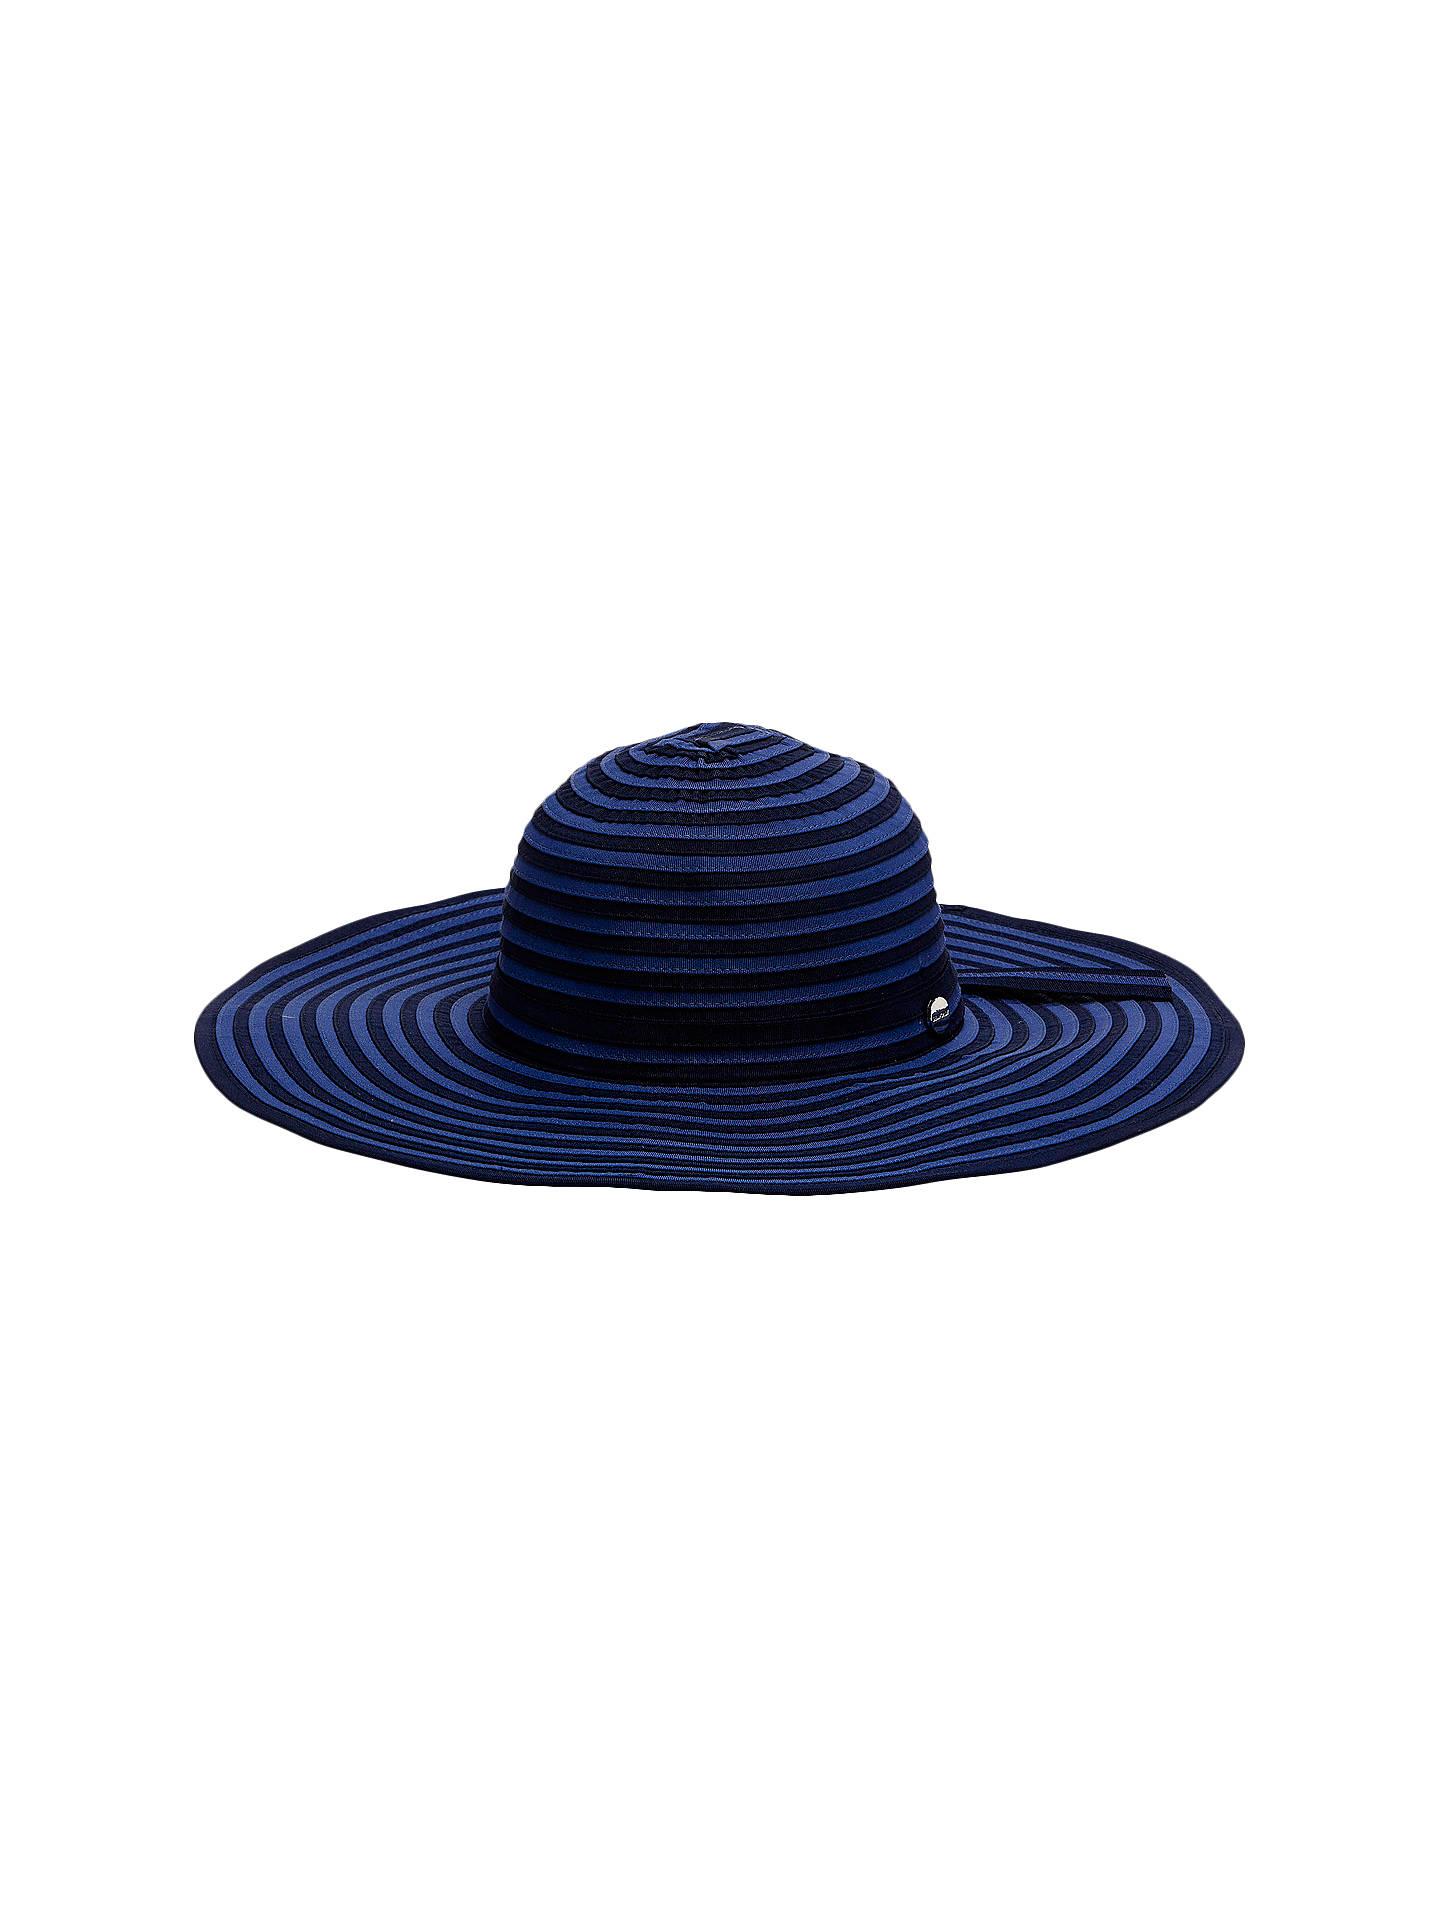 9f59eb76e Seafolly Shady Lady Hat, Indigo at John Lewis & Partners